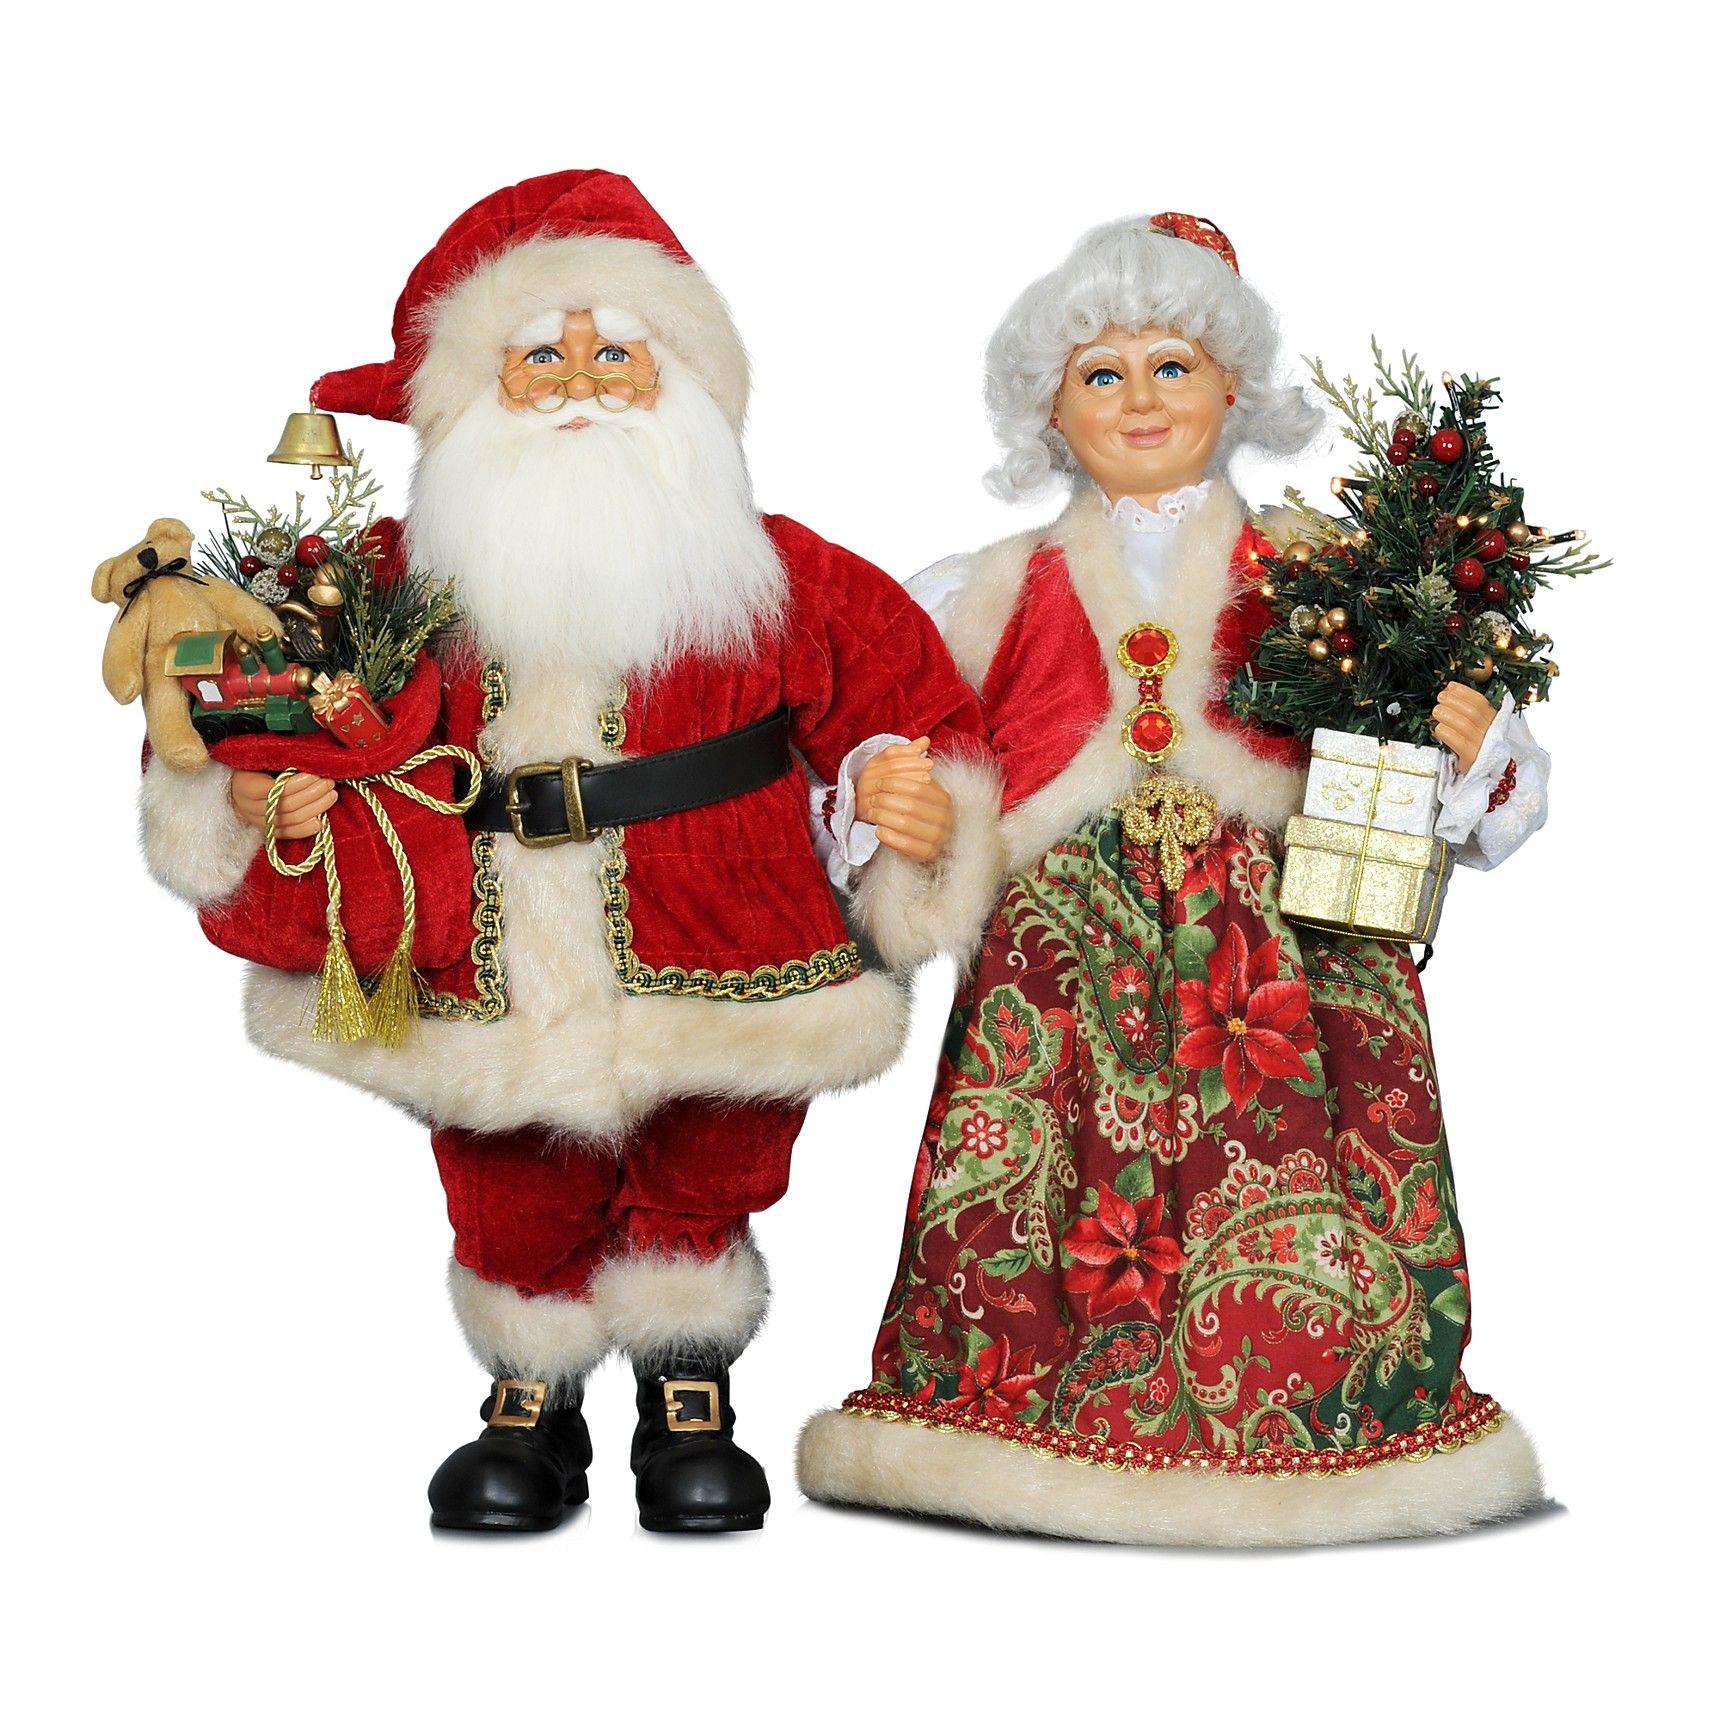 Mr and mrs claus ornaments - Karen Didion Originals Mr Mrs Claus Figurines